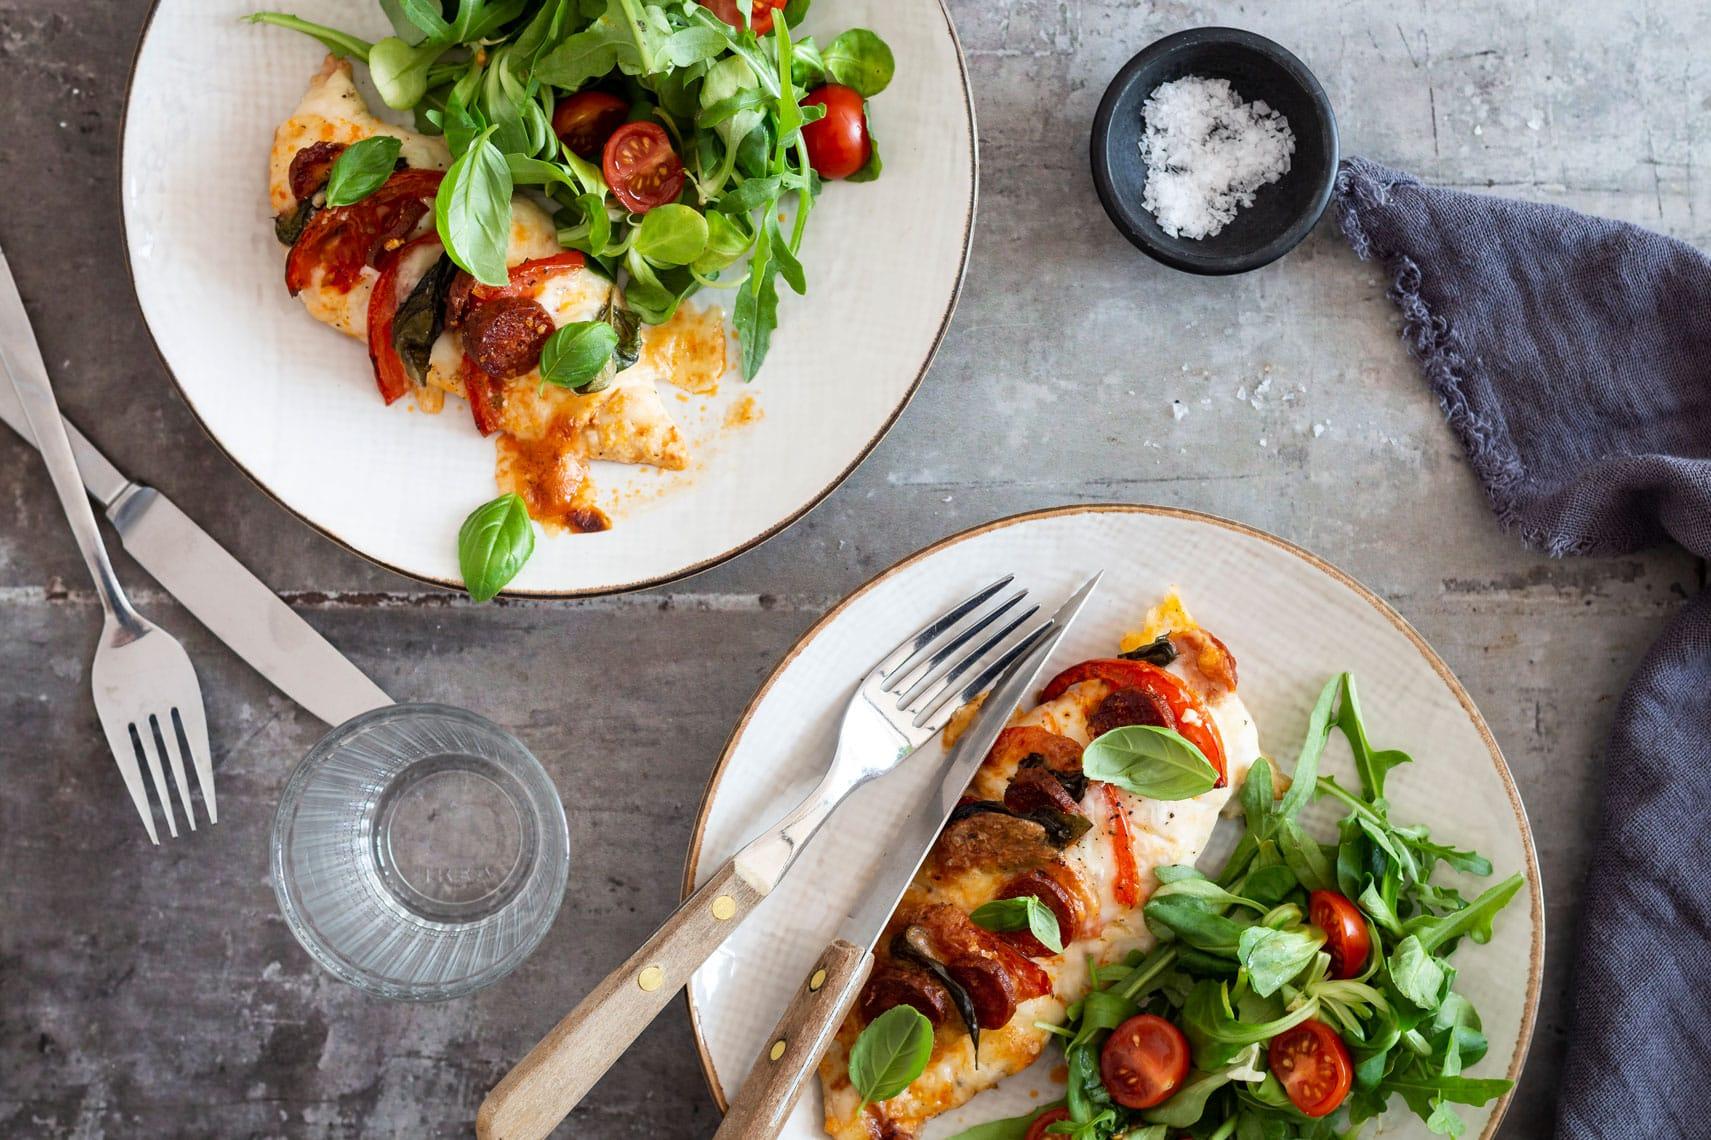 Hasselback kylling med chorizo og mozzarella - lækker KETO opskrift med kylling